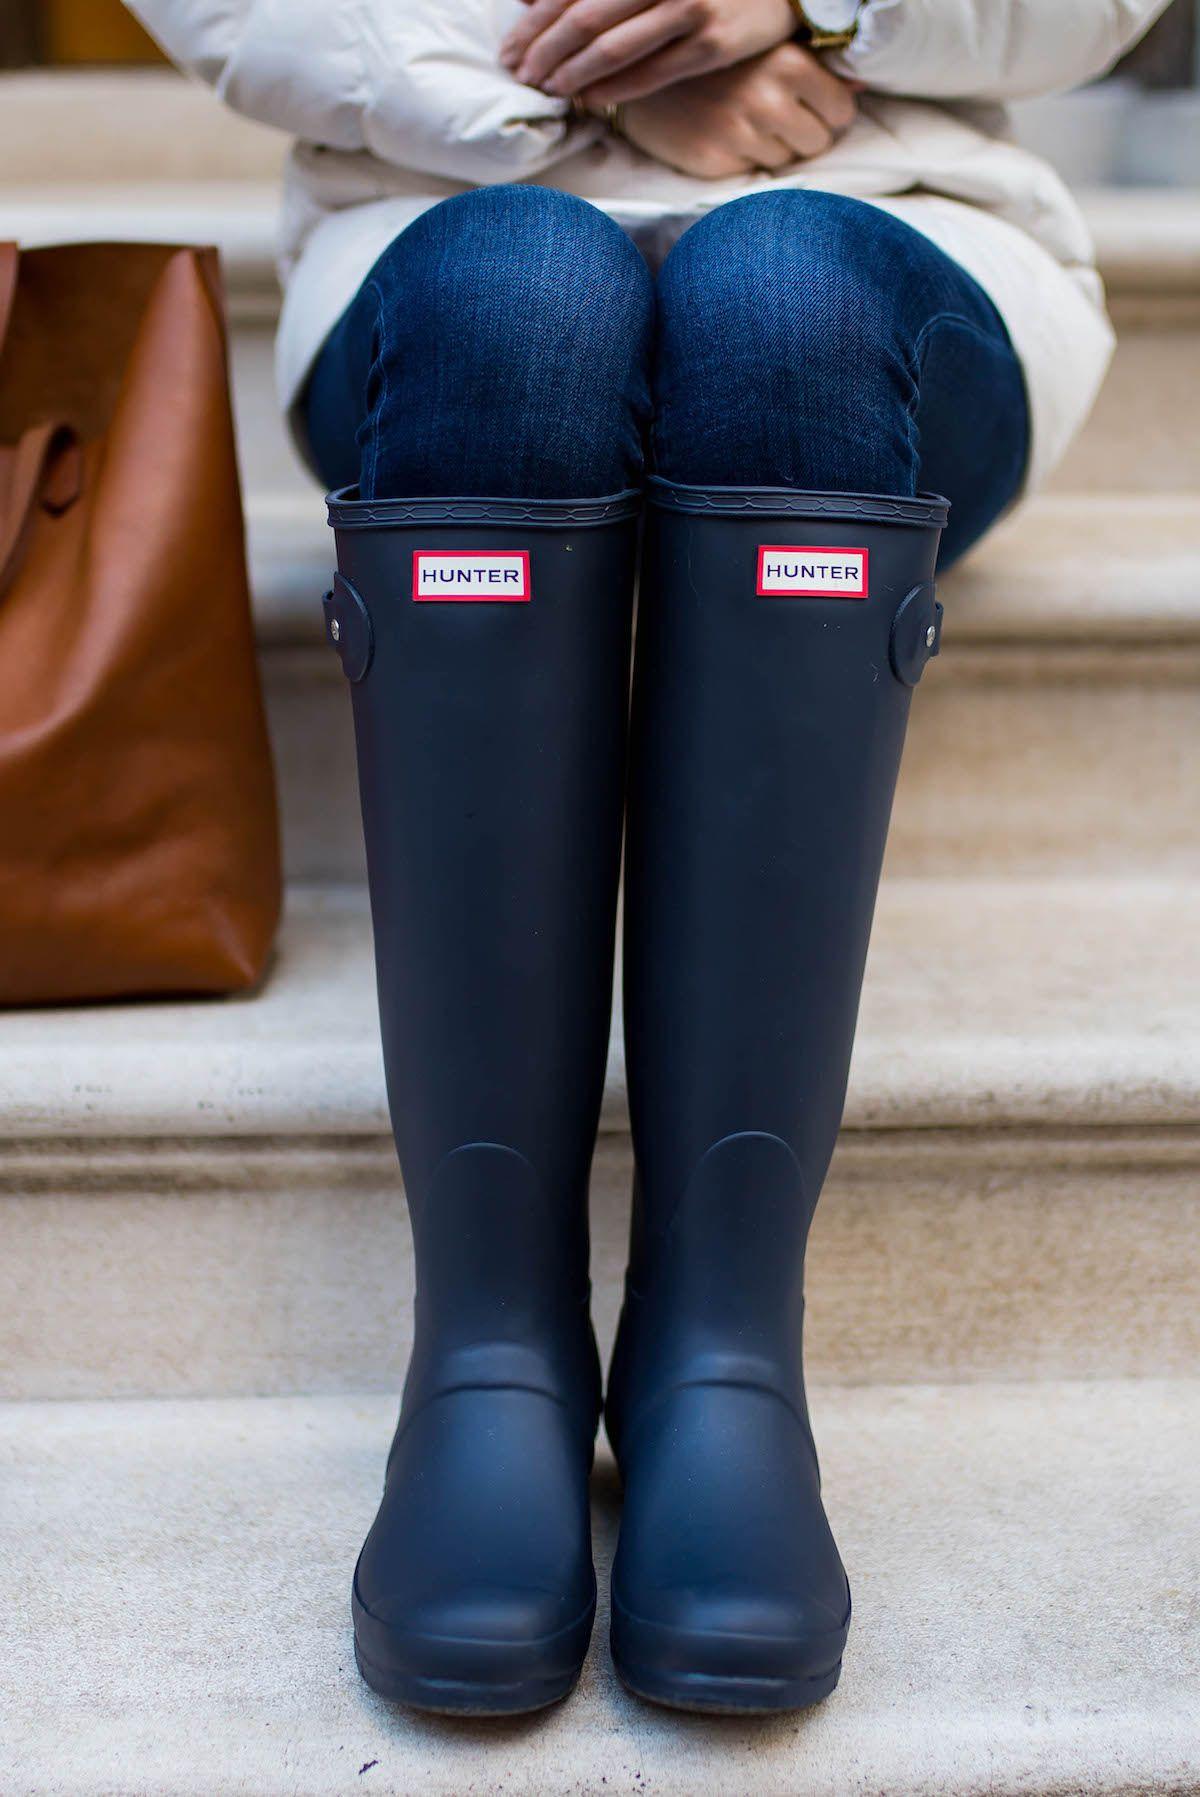 29dbce4443 Navy Hunter Rain Boots + Winter Coat Sale - Katie s Bliss